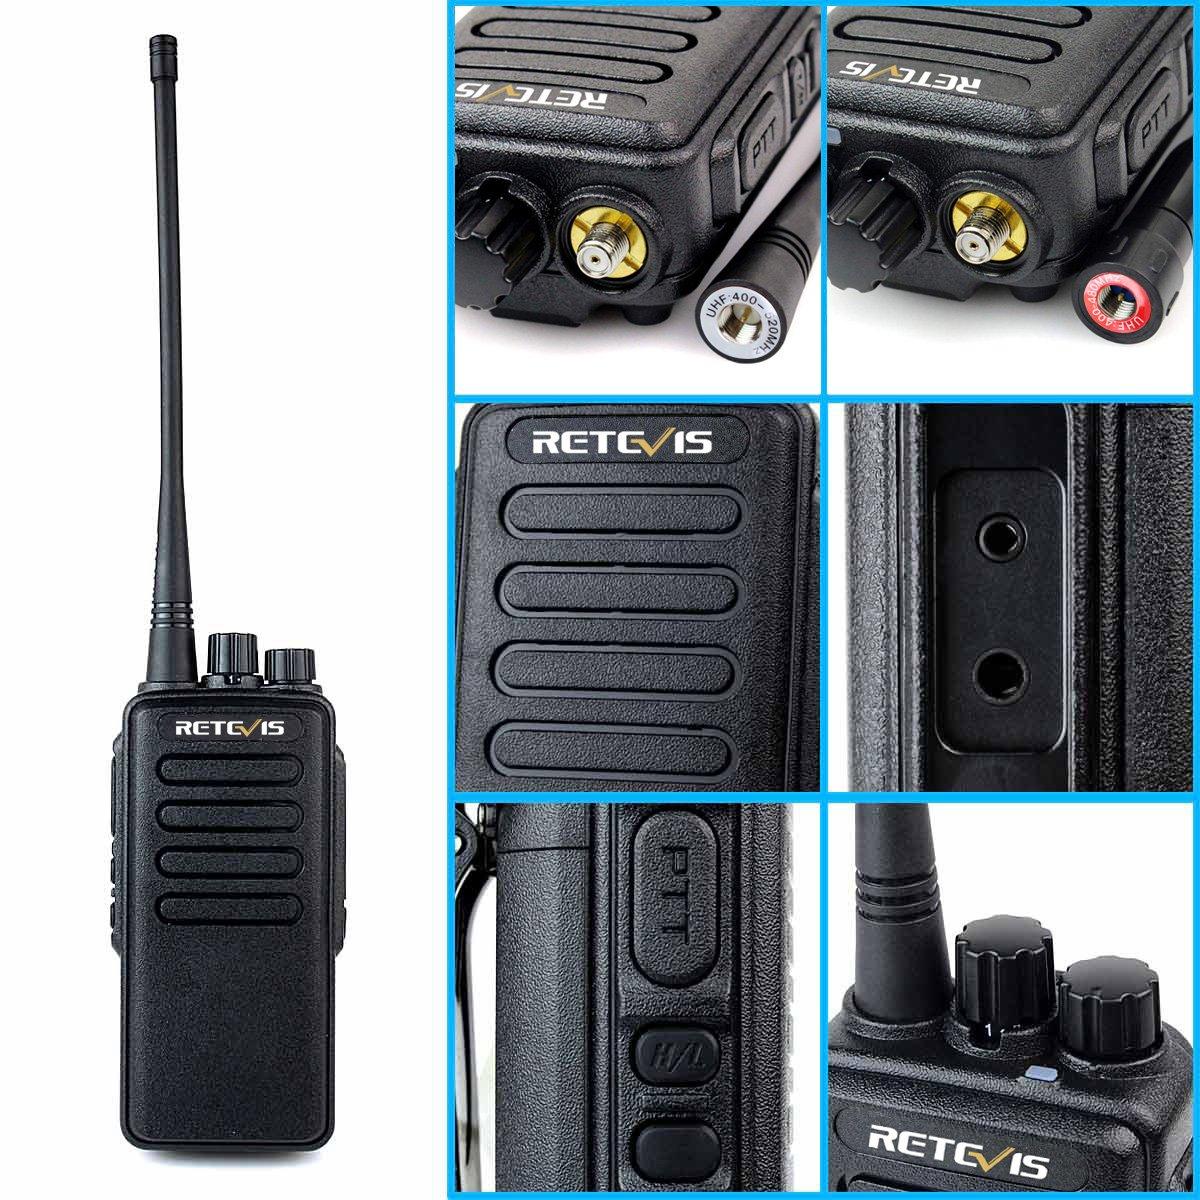 Retevis RT1 10W UHF Two Way Radio 70CM 400-520 MHz 16CH VOX Scrambler Ham radio and Speaker Mic (5 Pack) by Retevis (Image #7)